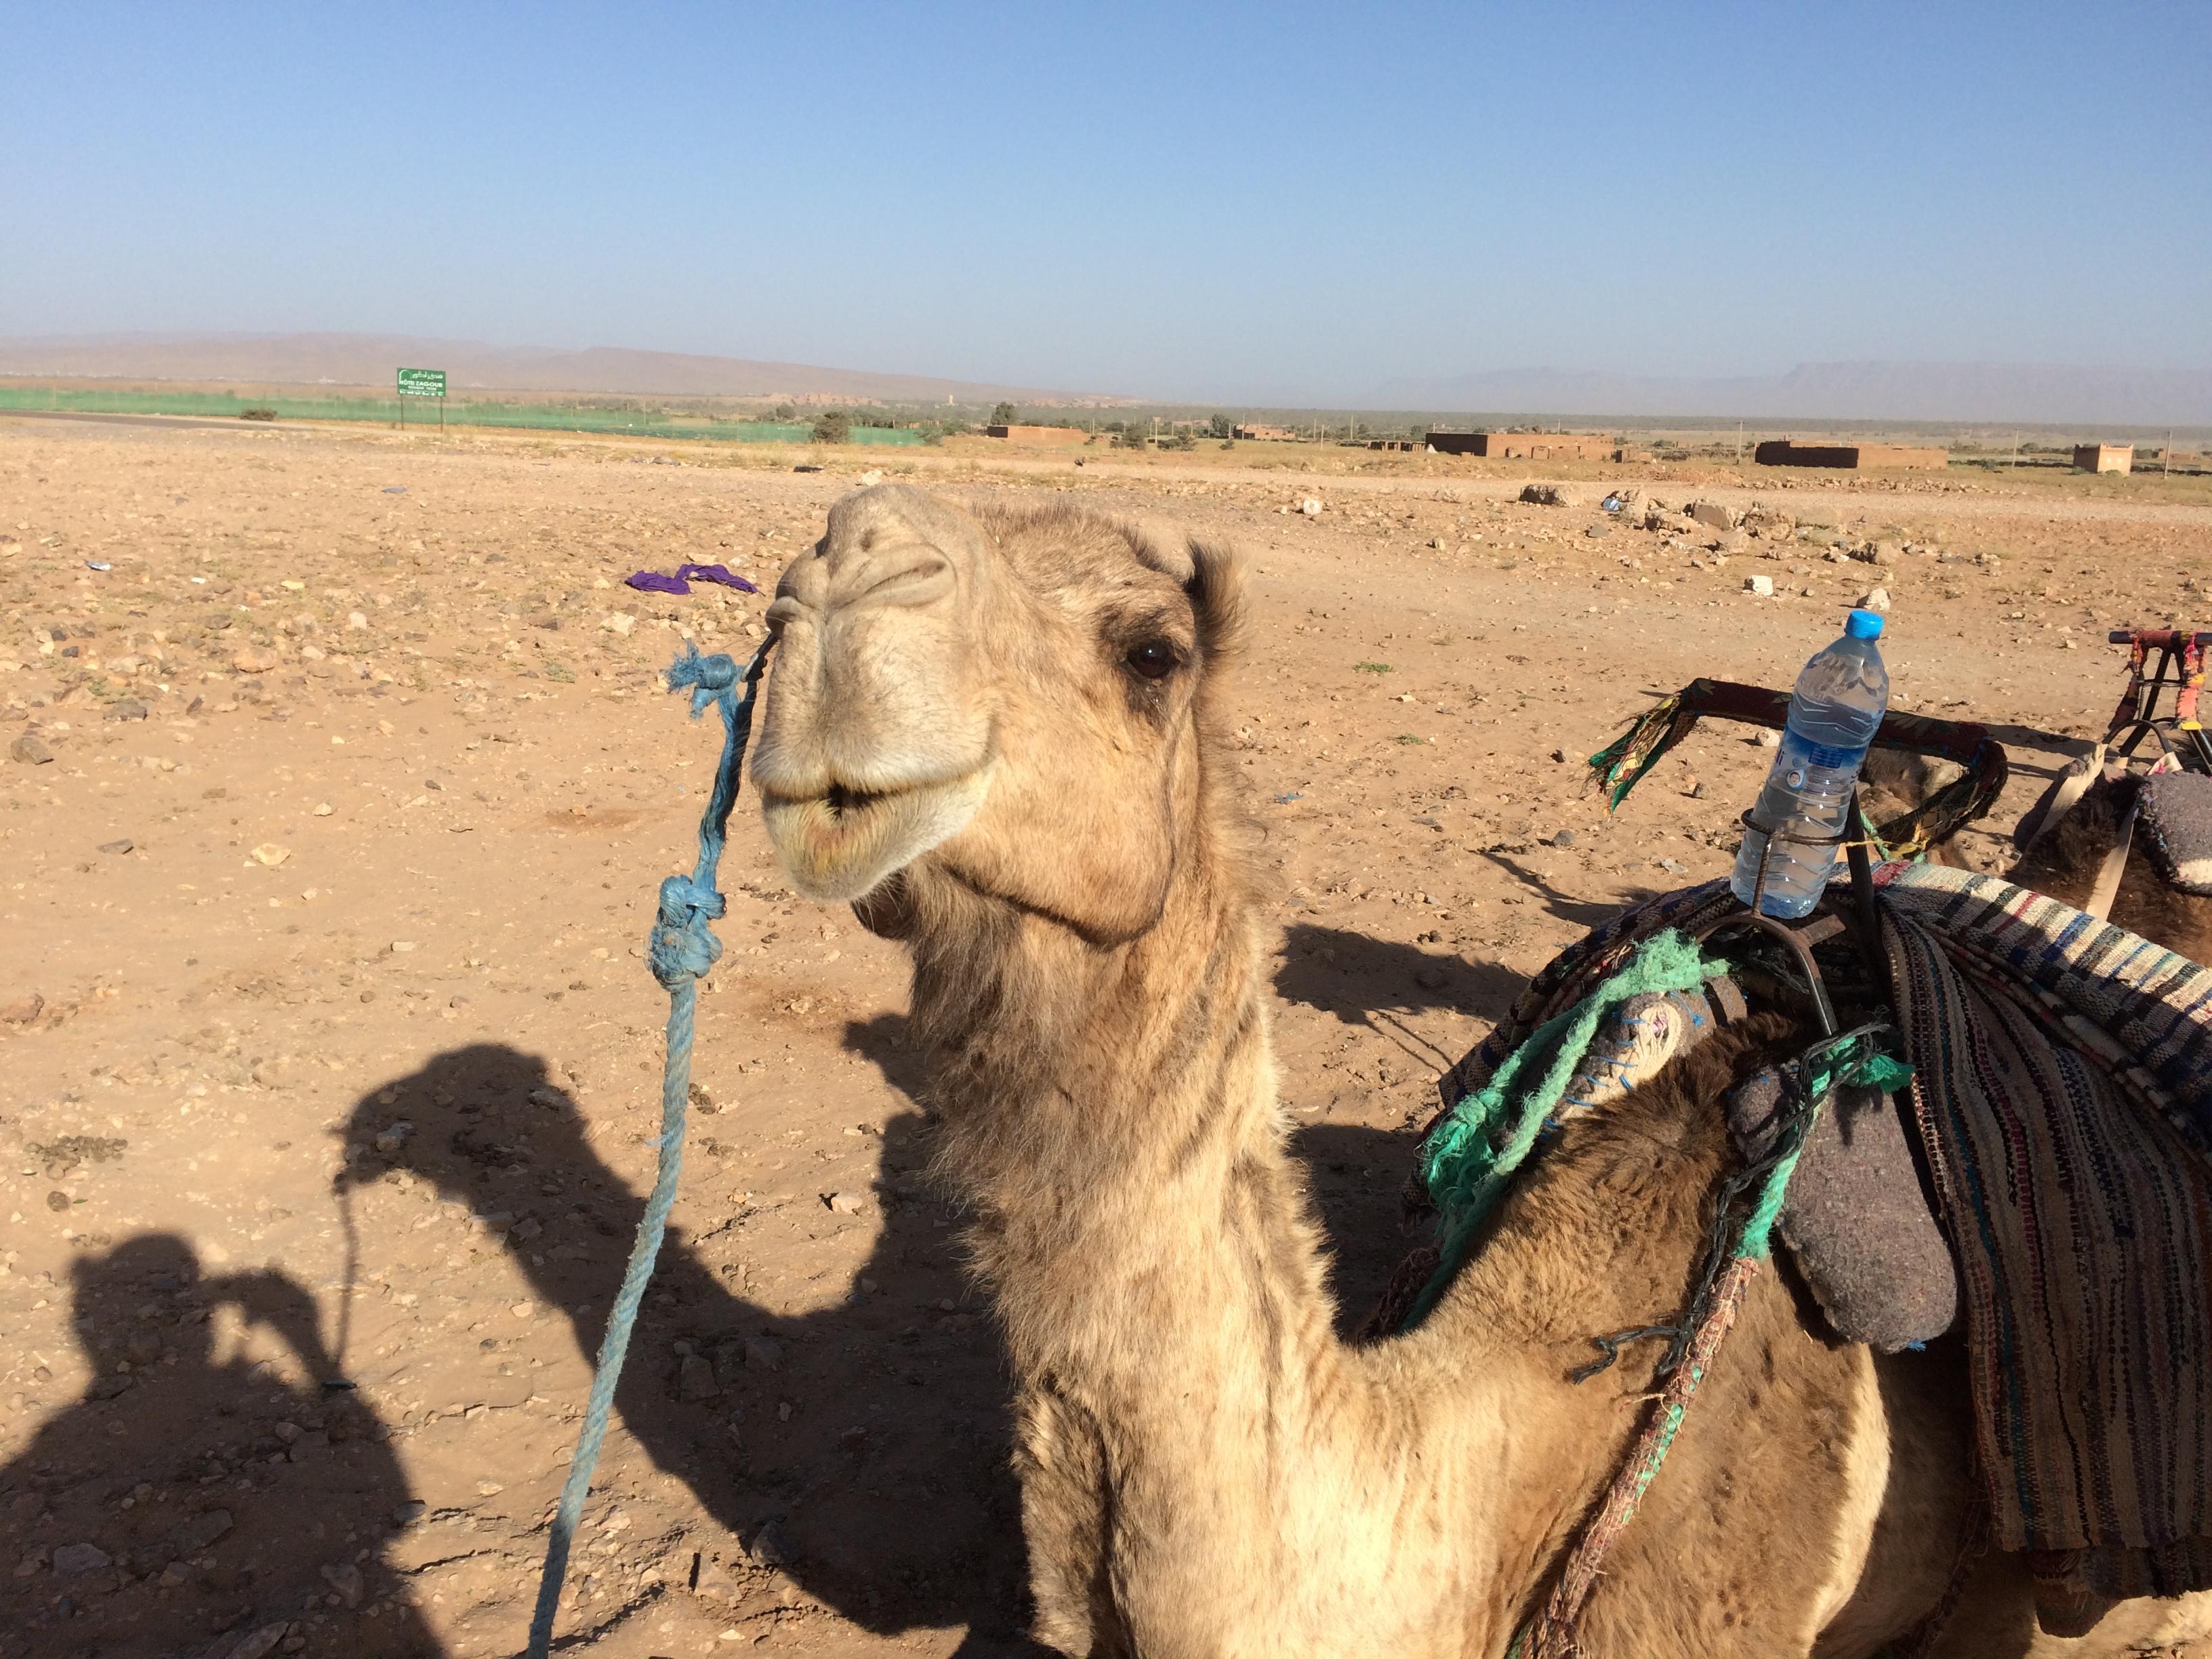 Dromedário_deserto_zagora_marrocos.JPG